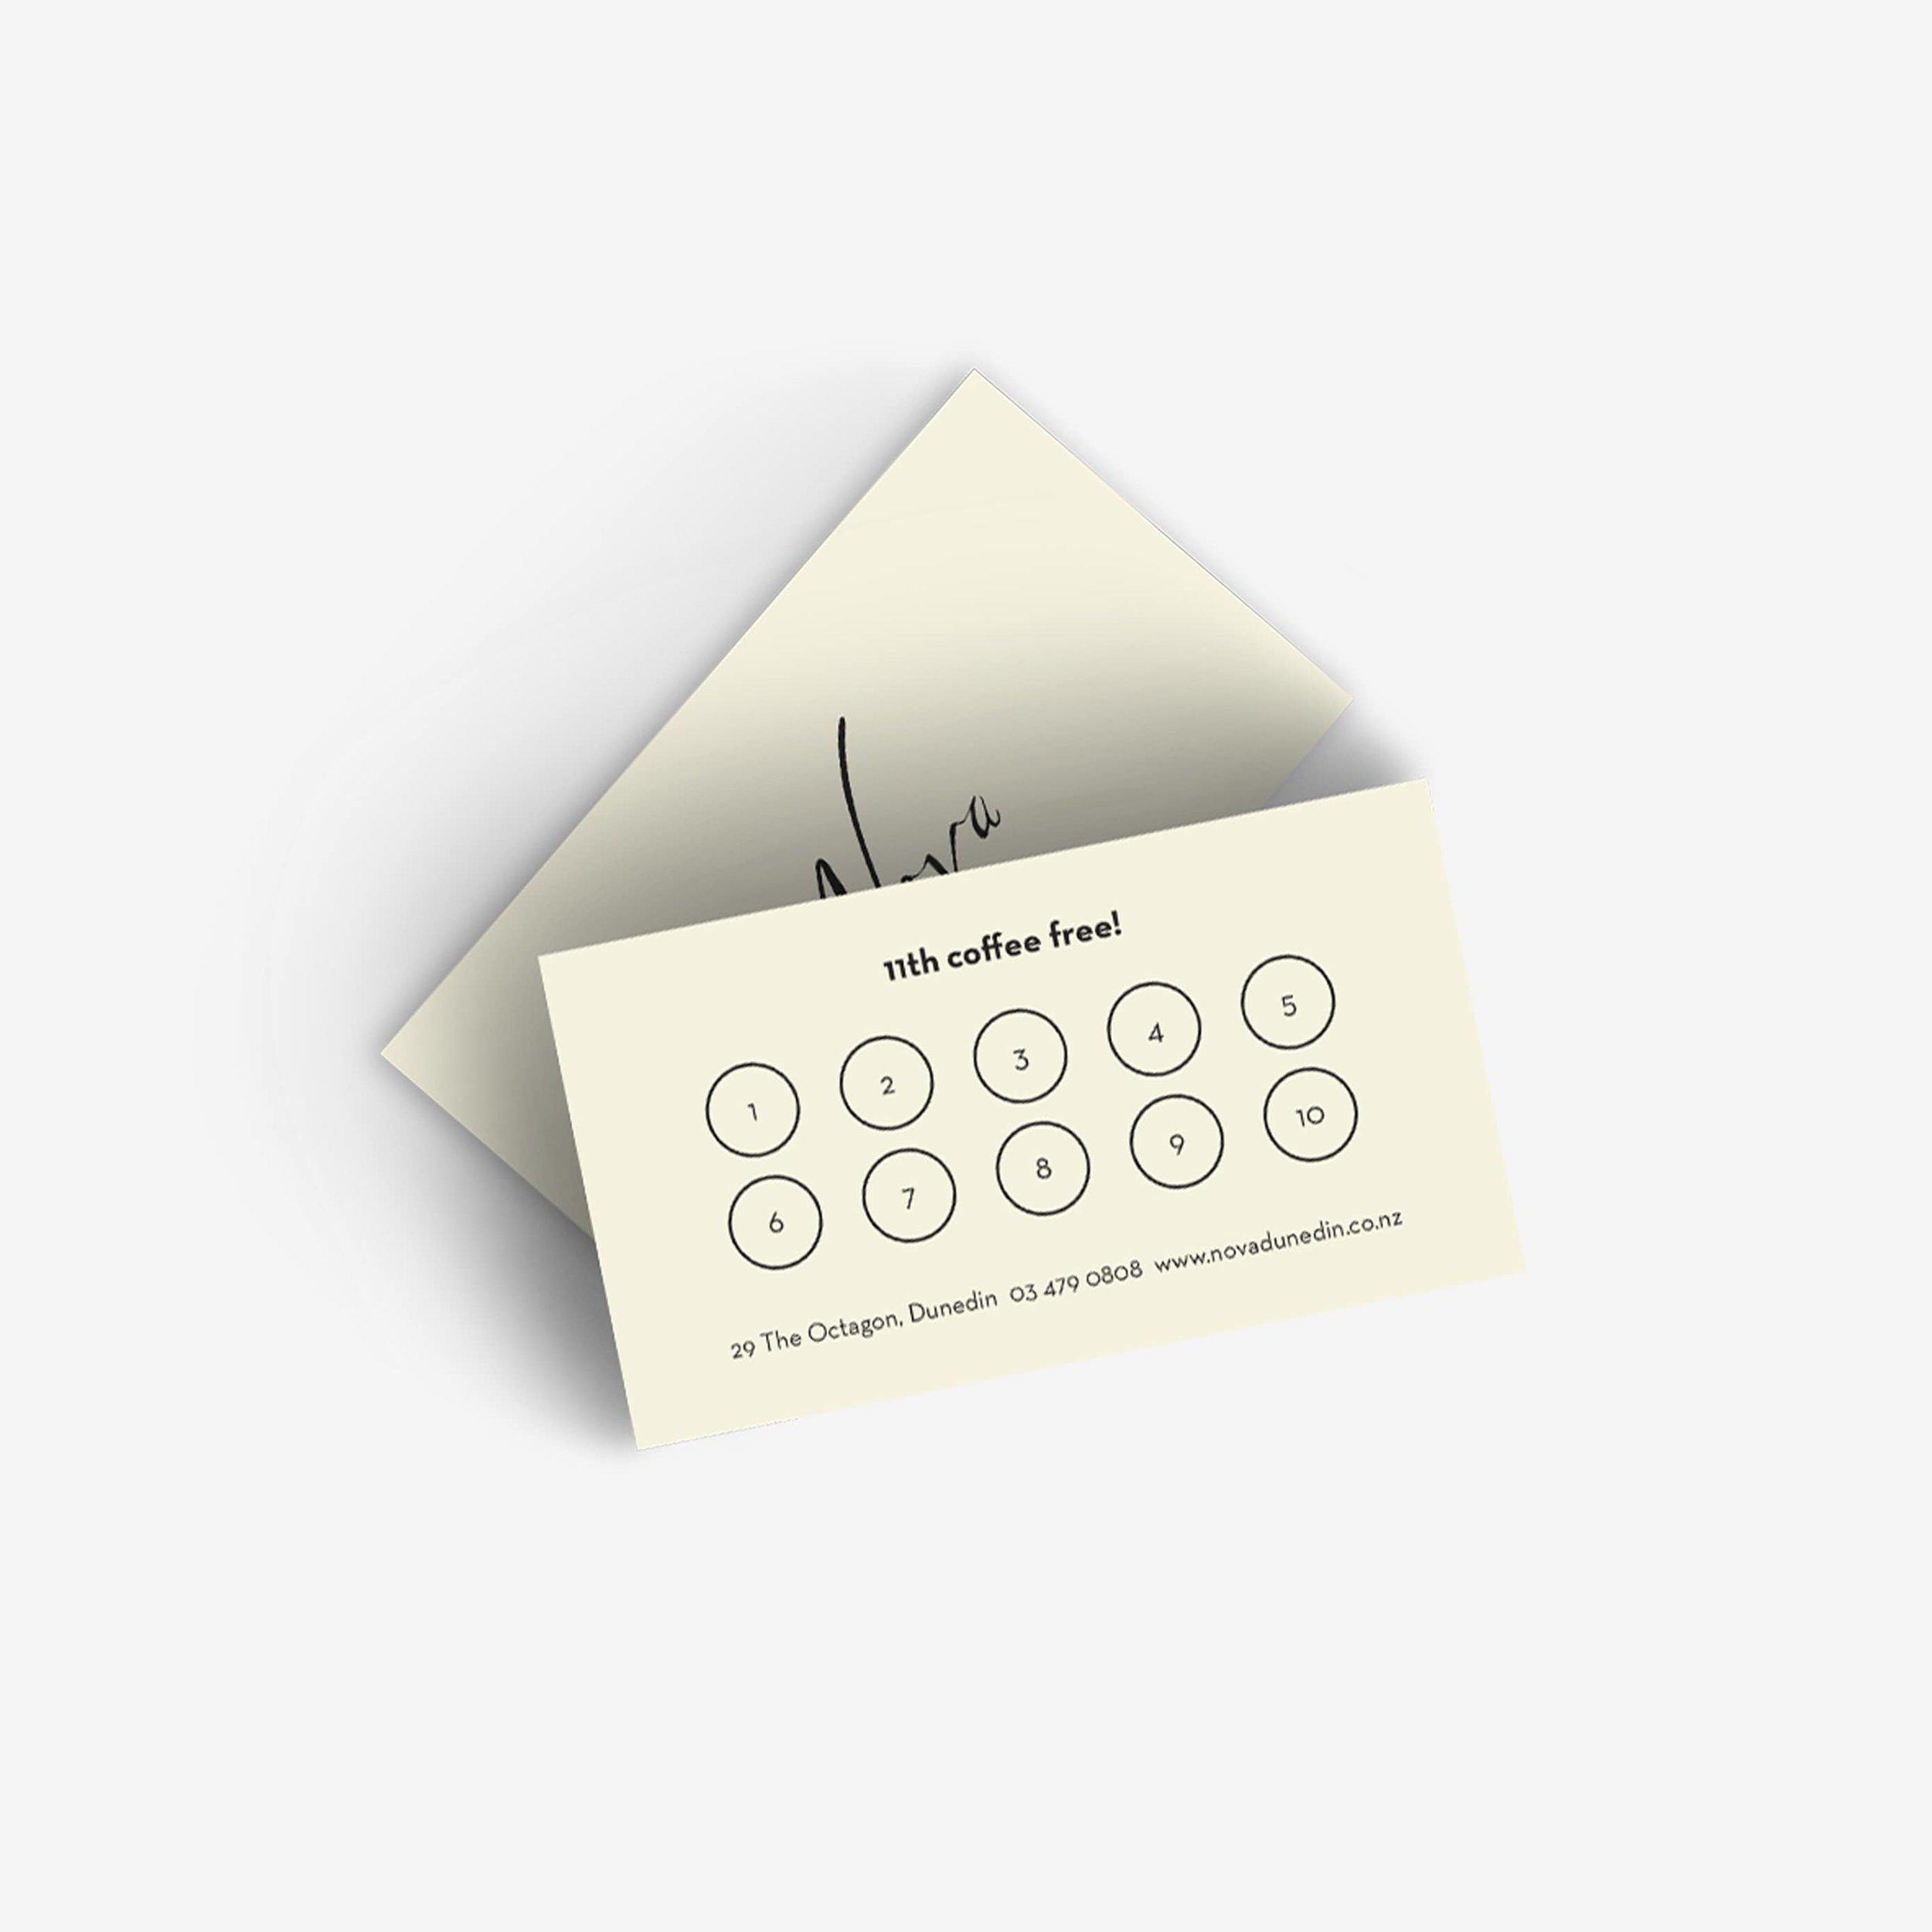 Nova - Coffee Card (square)-min.jpg